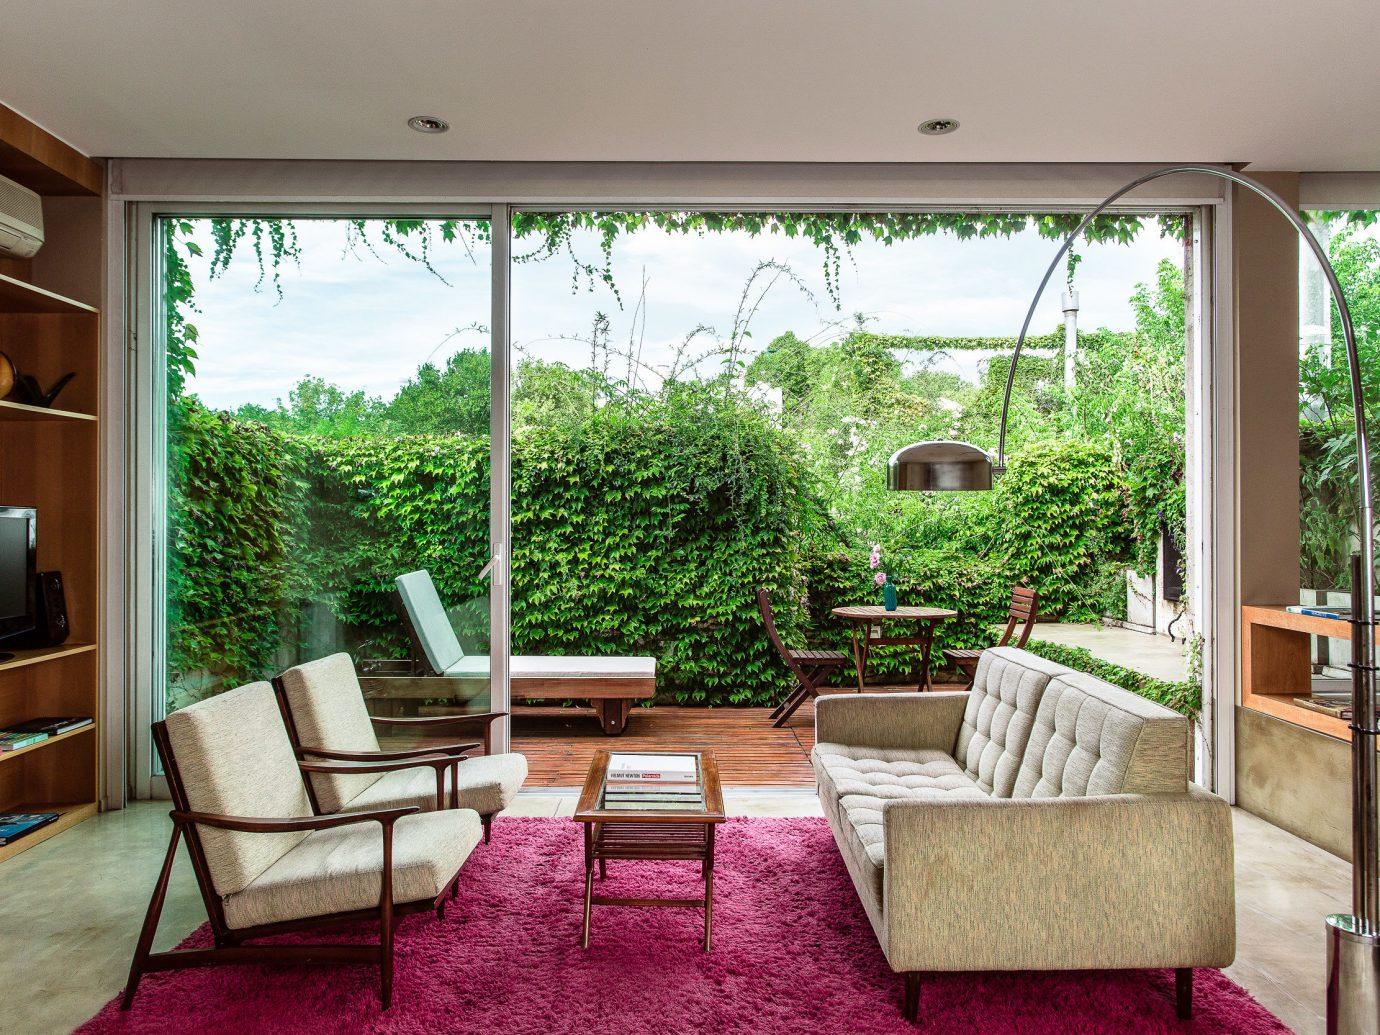 Trip Ideas window floor indoor Living room Architecture living room interior design house home real estate estate furniture table